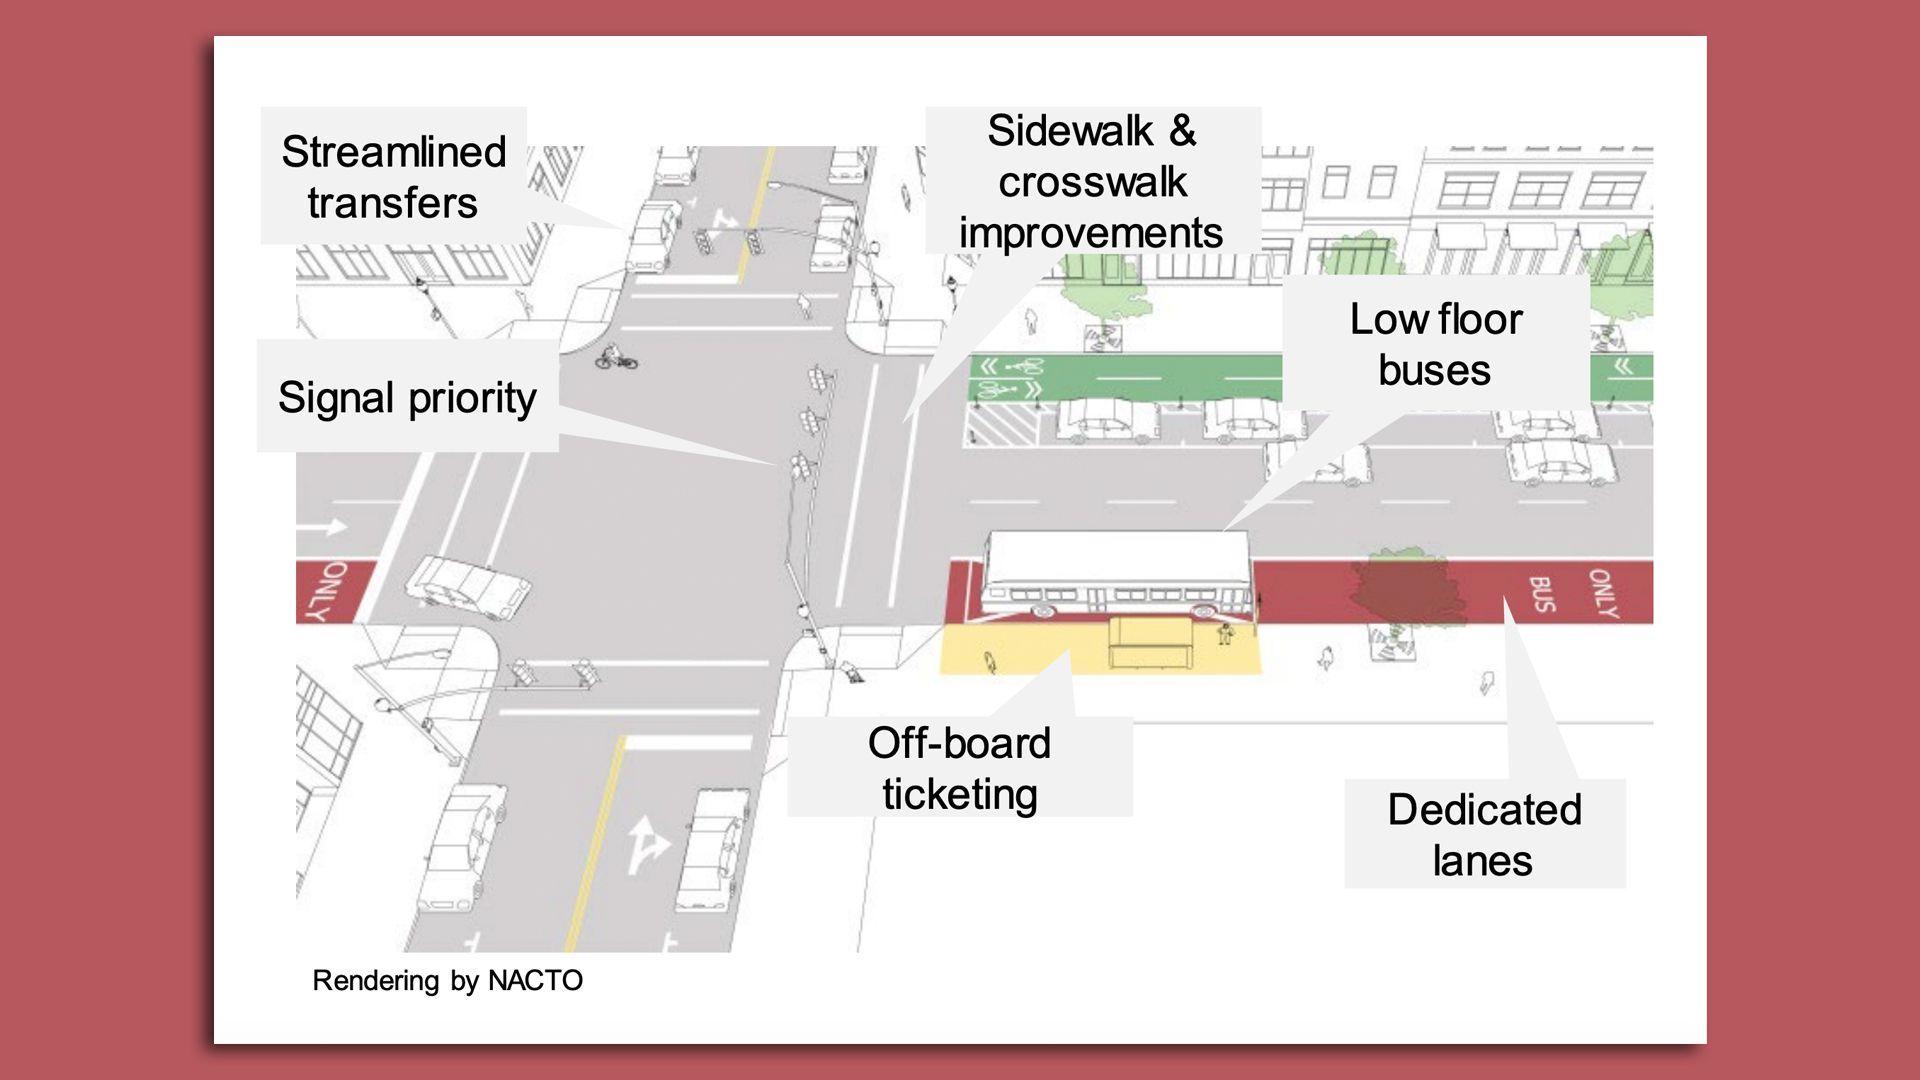 A rendering of MARTA's bus rapid transit line